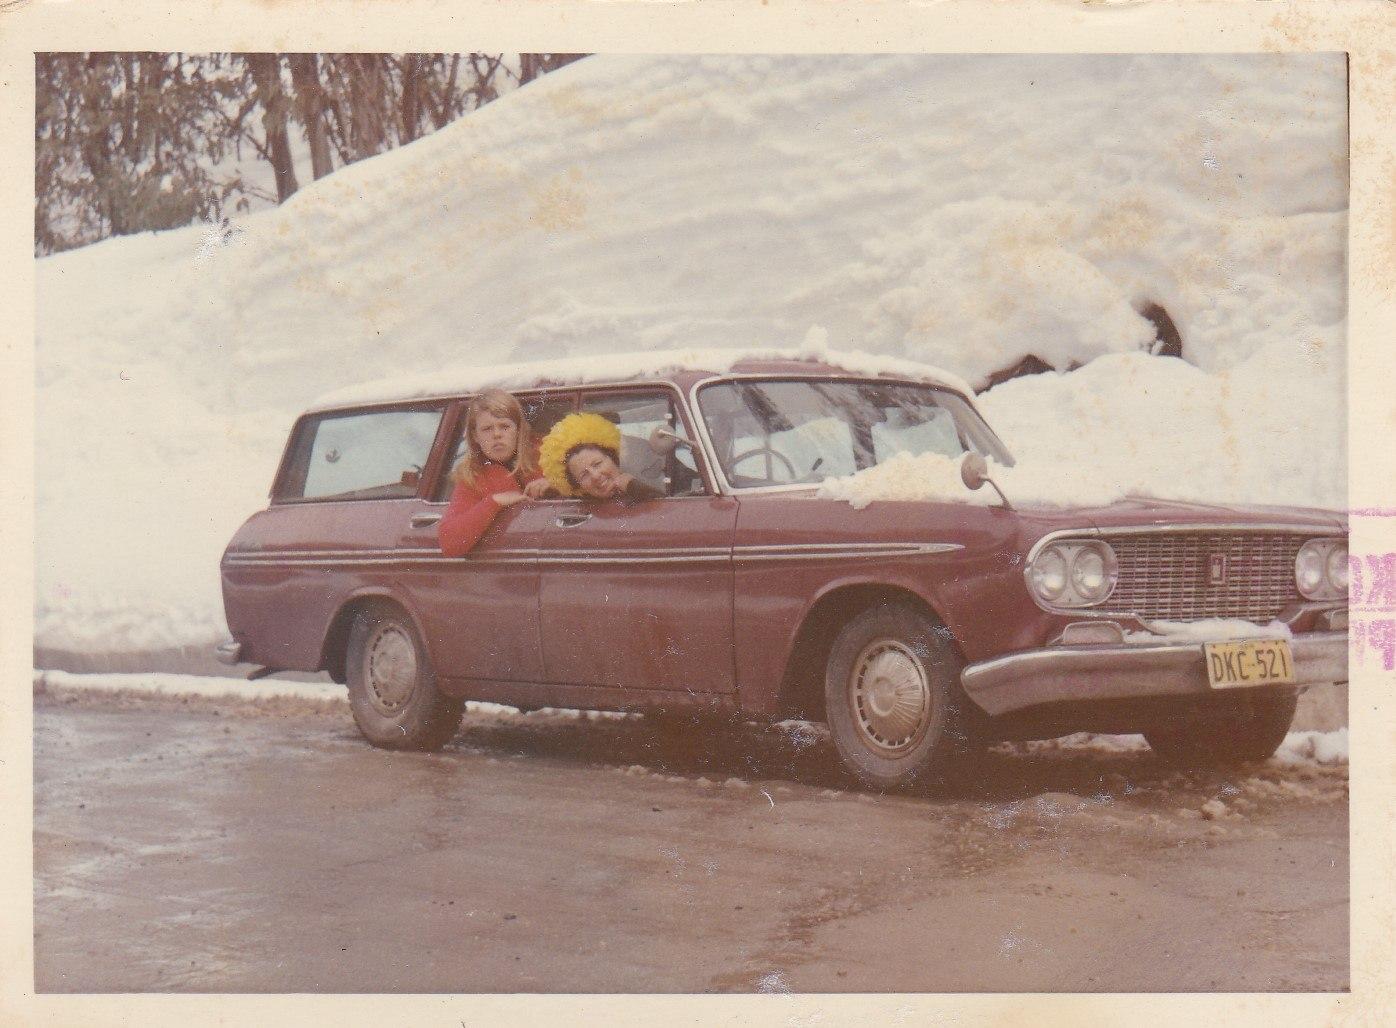 Snowdrift and fresh snow - Xmas day 1969.jpg